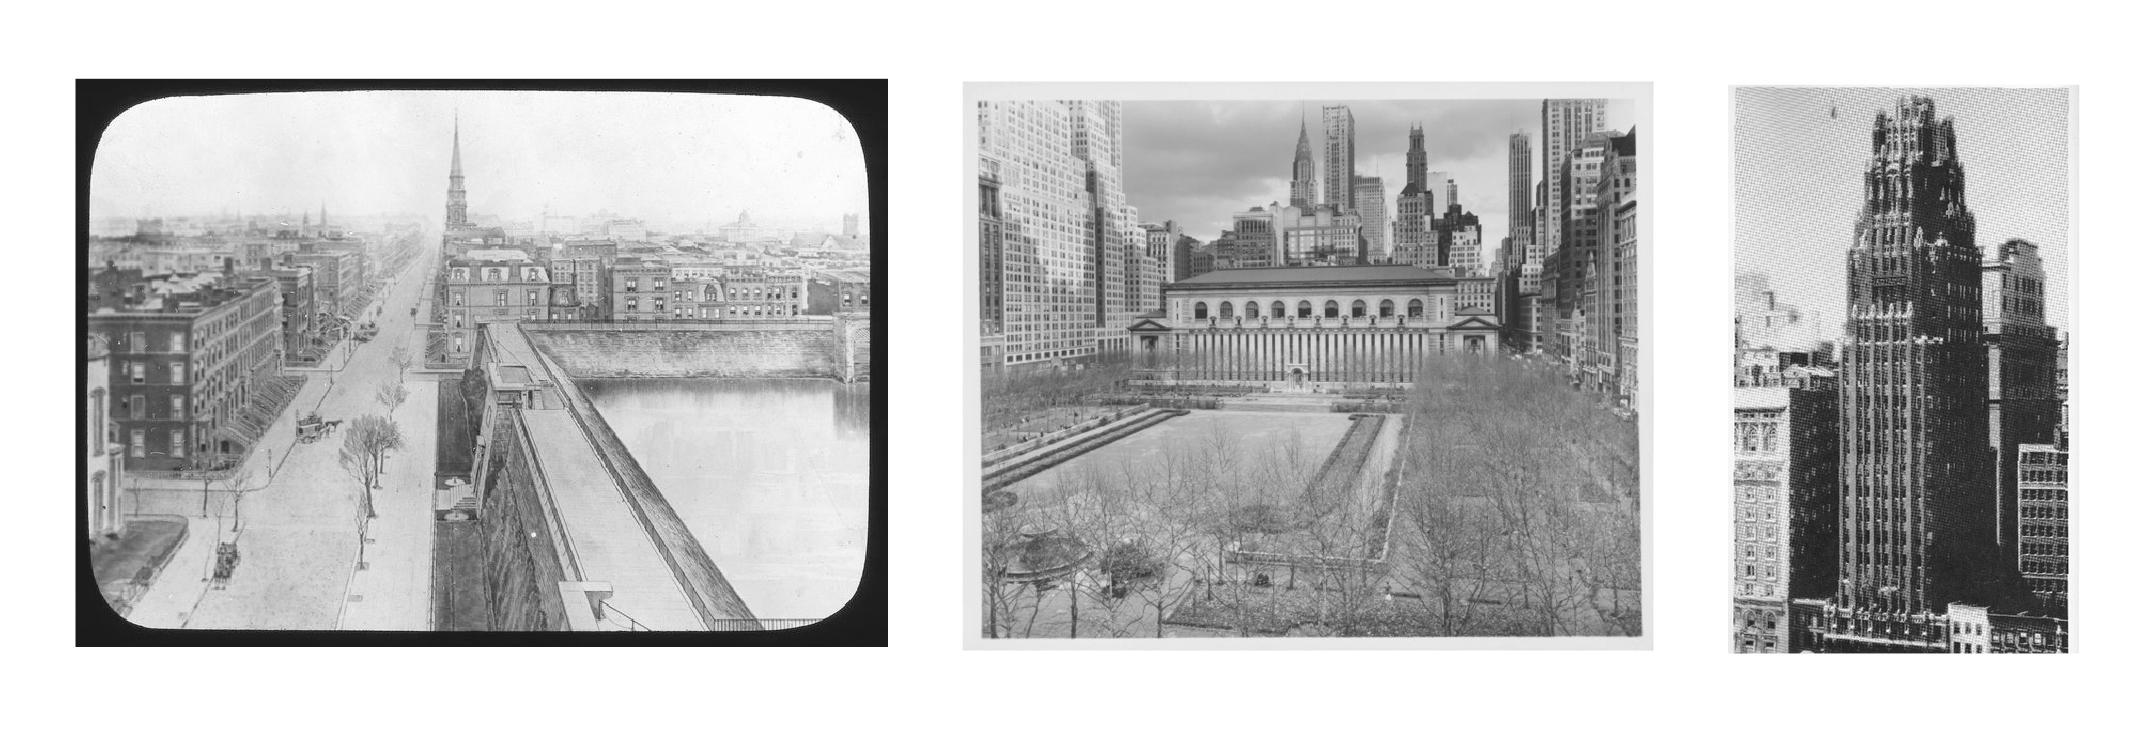 Croton Reservoir, New York Public Library, & American Radiator Building